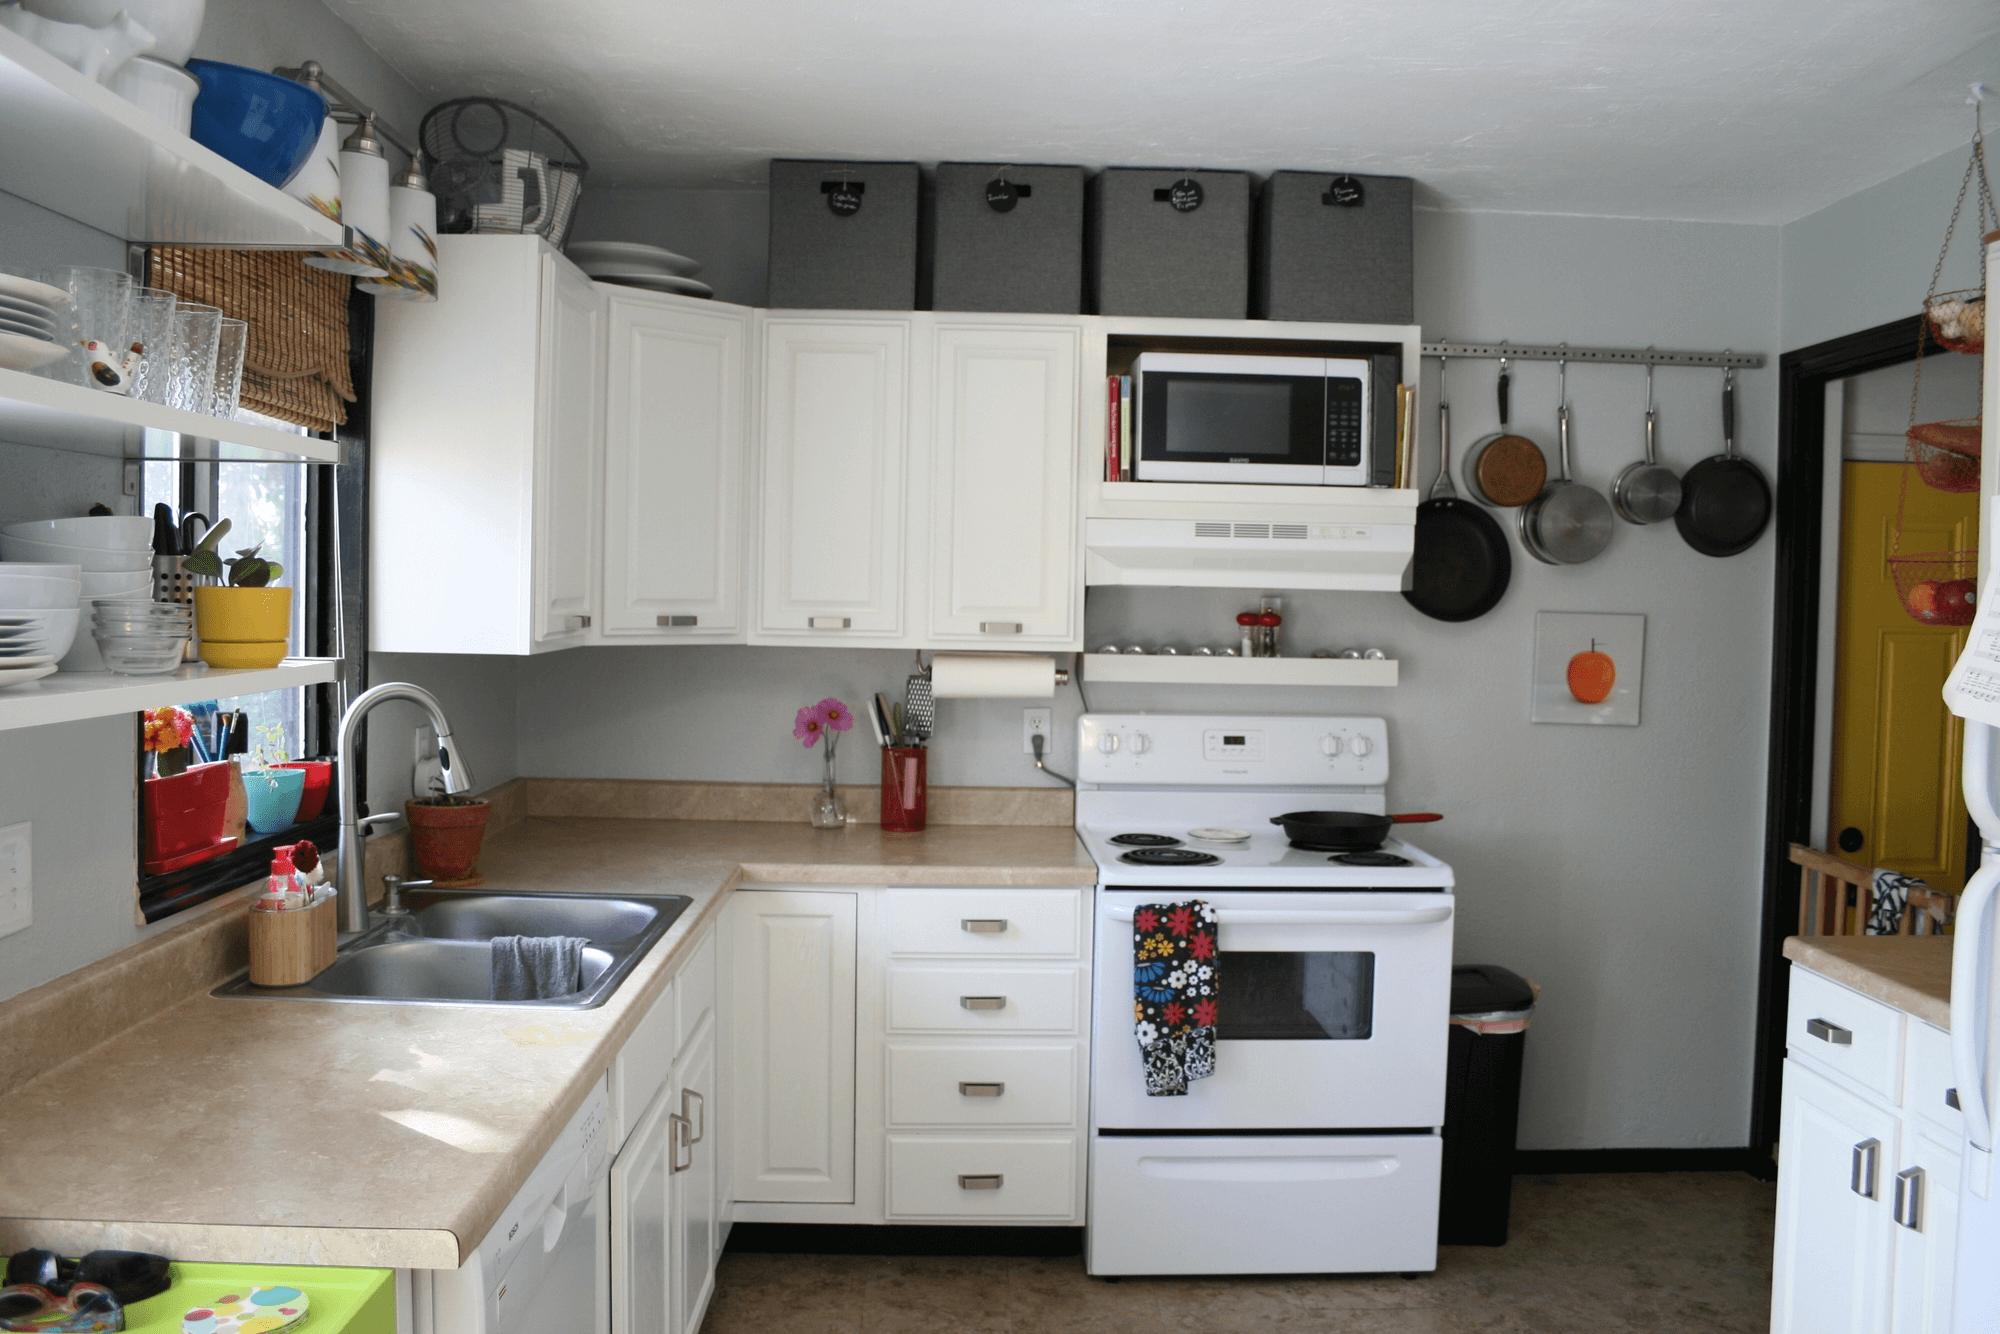 The Small Kitchen Appliance Storage Ideas Small Kitchen Guides Above Kitchen Cabinets Kitchen Cabinet Storage Small Kitchen Appliance Storage